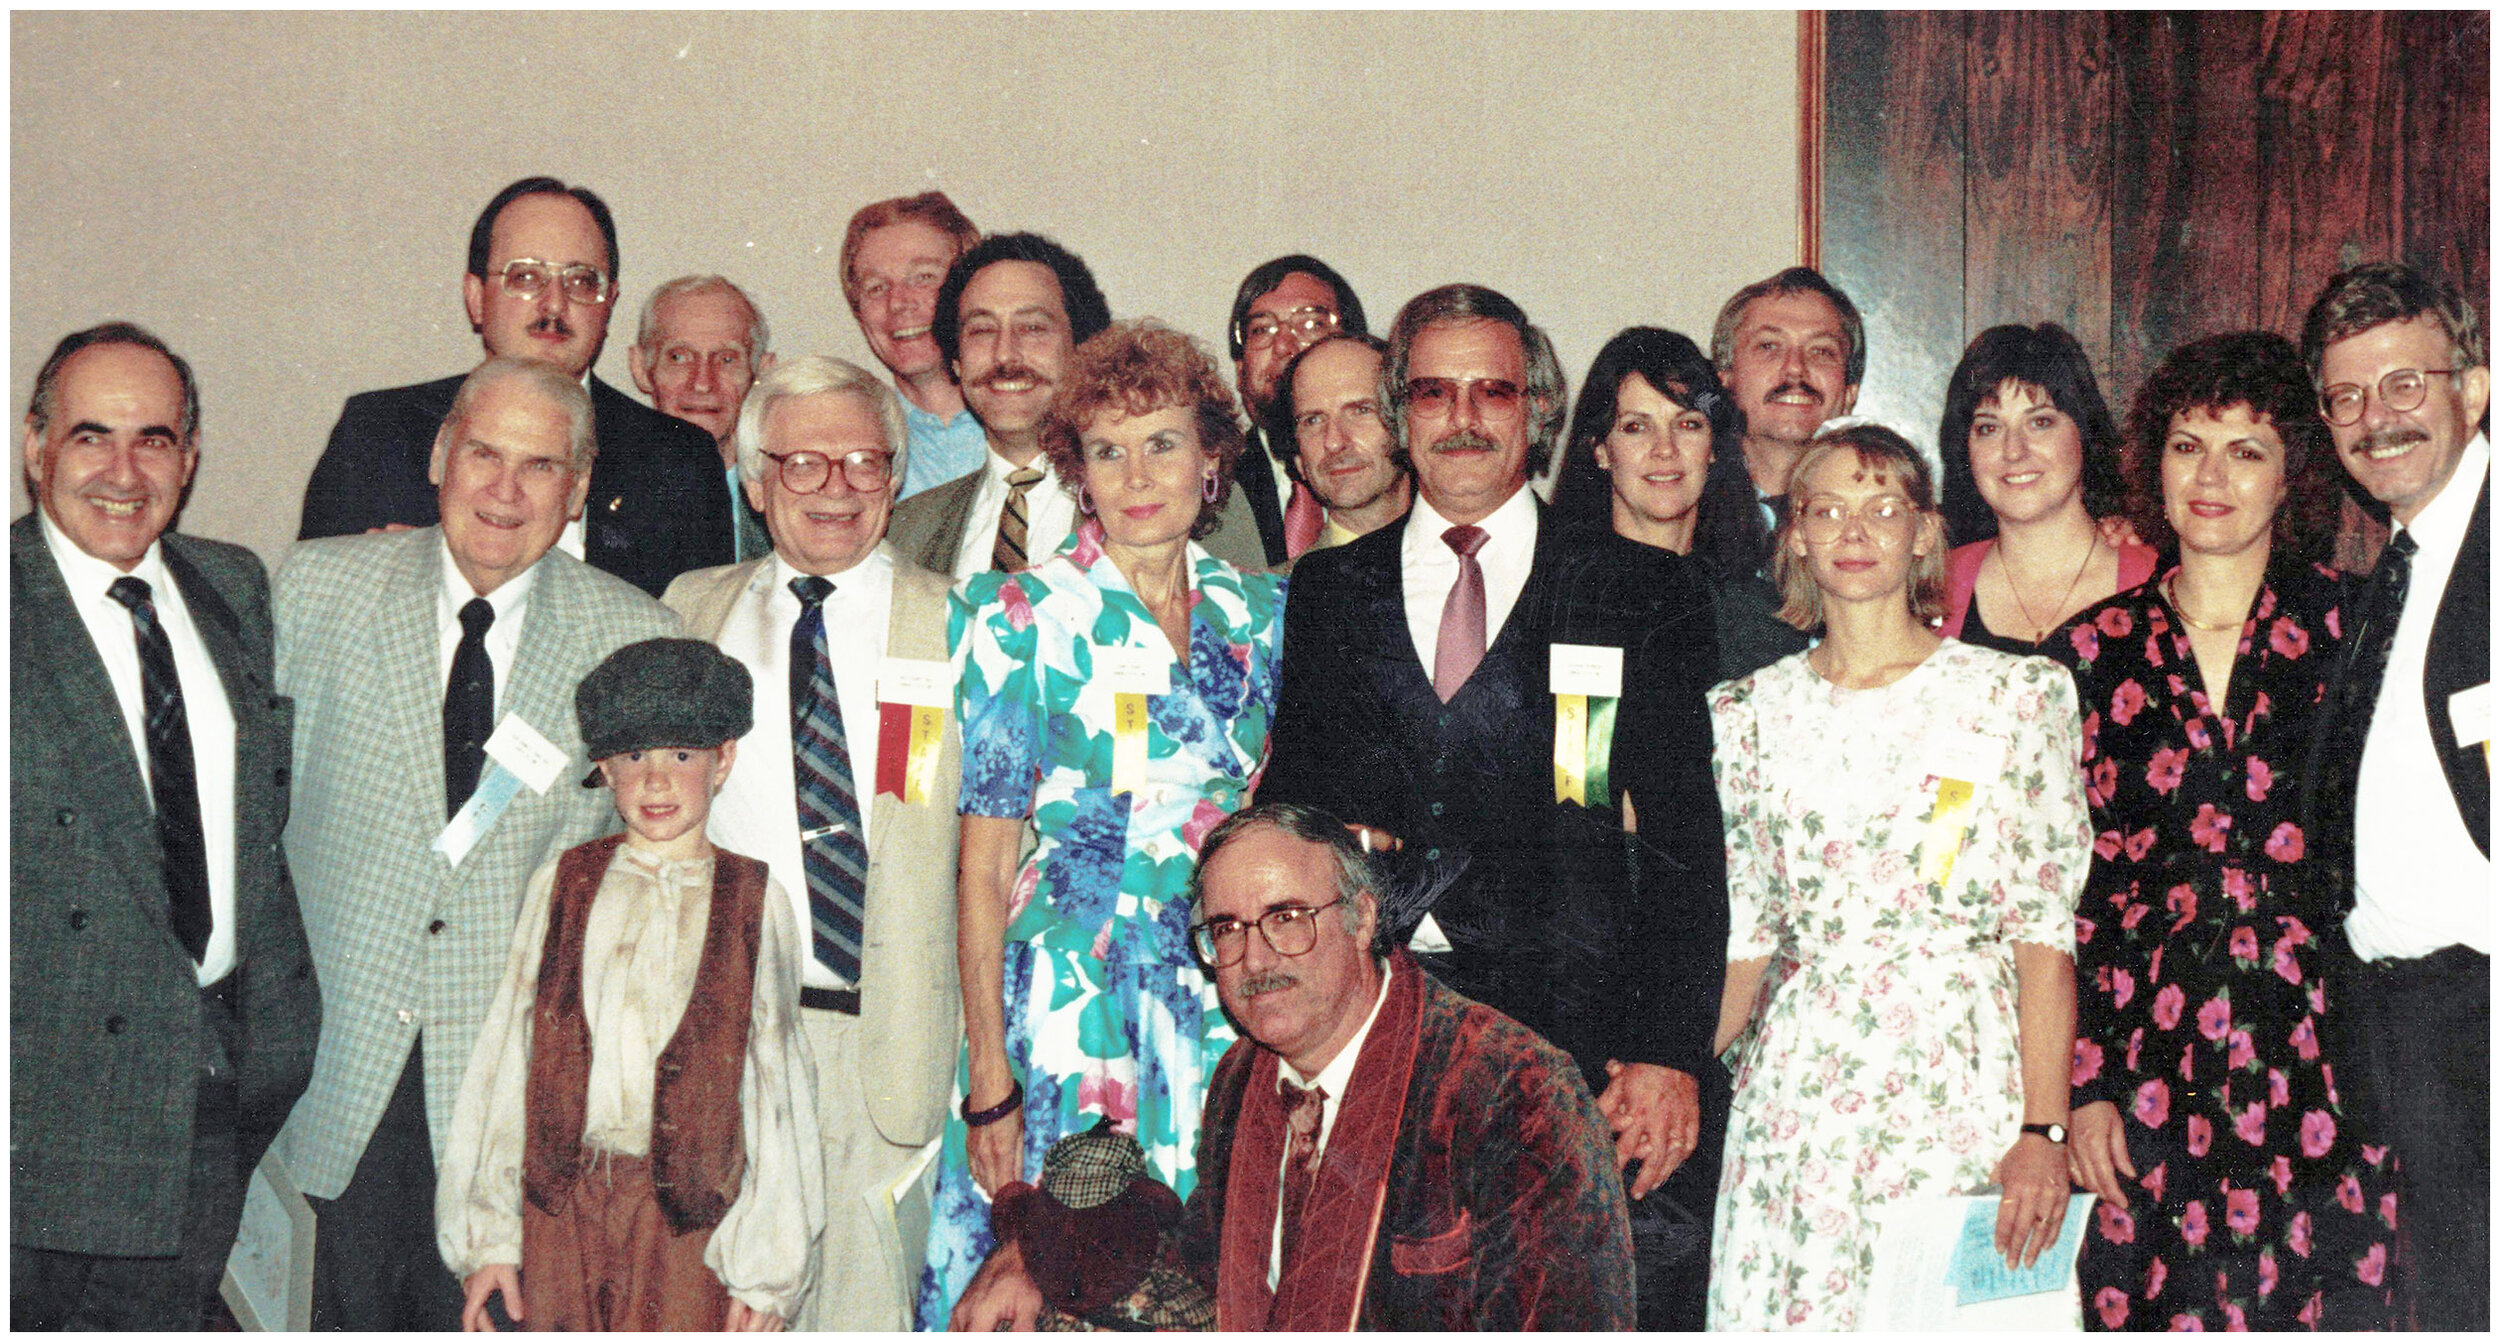 HOLMES ON THE RANGE AUGUST 1990.jpg